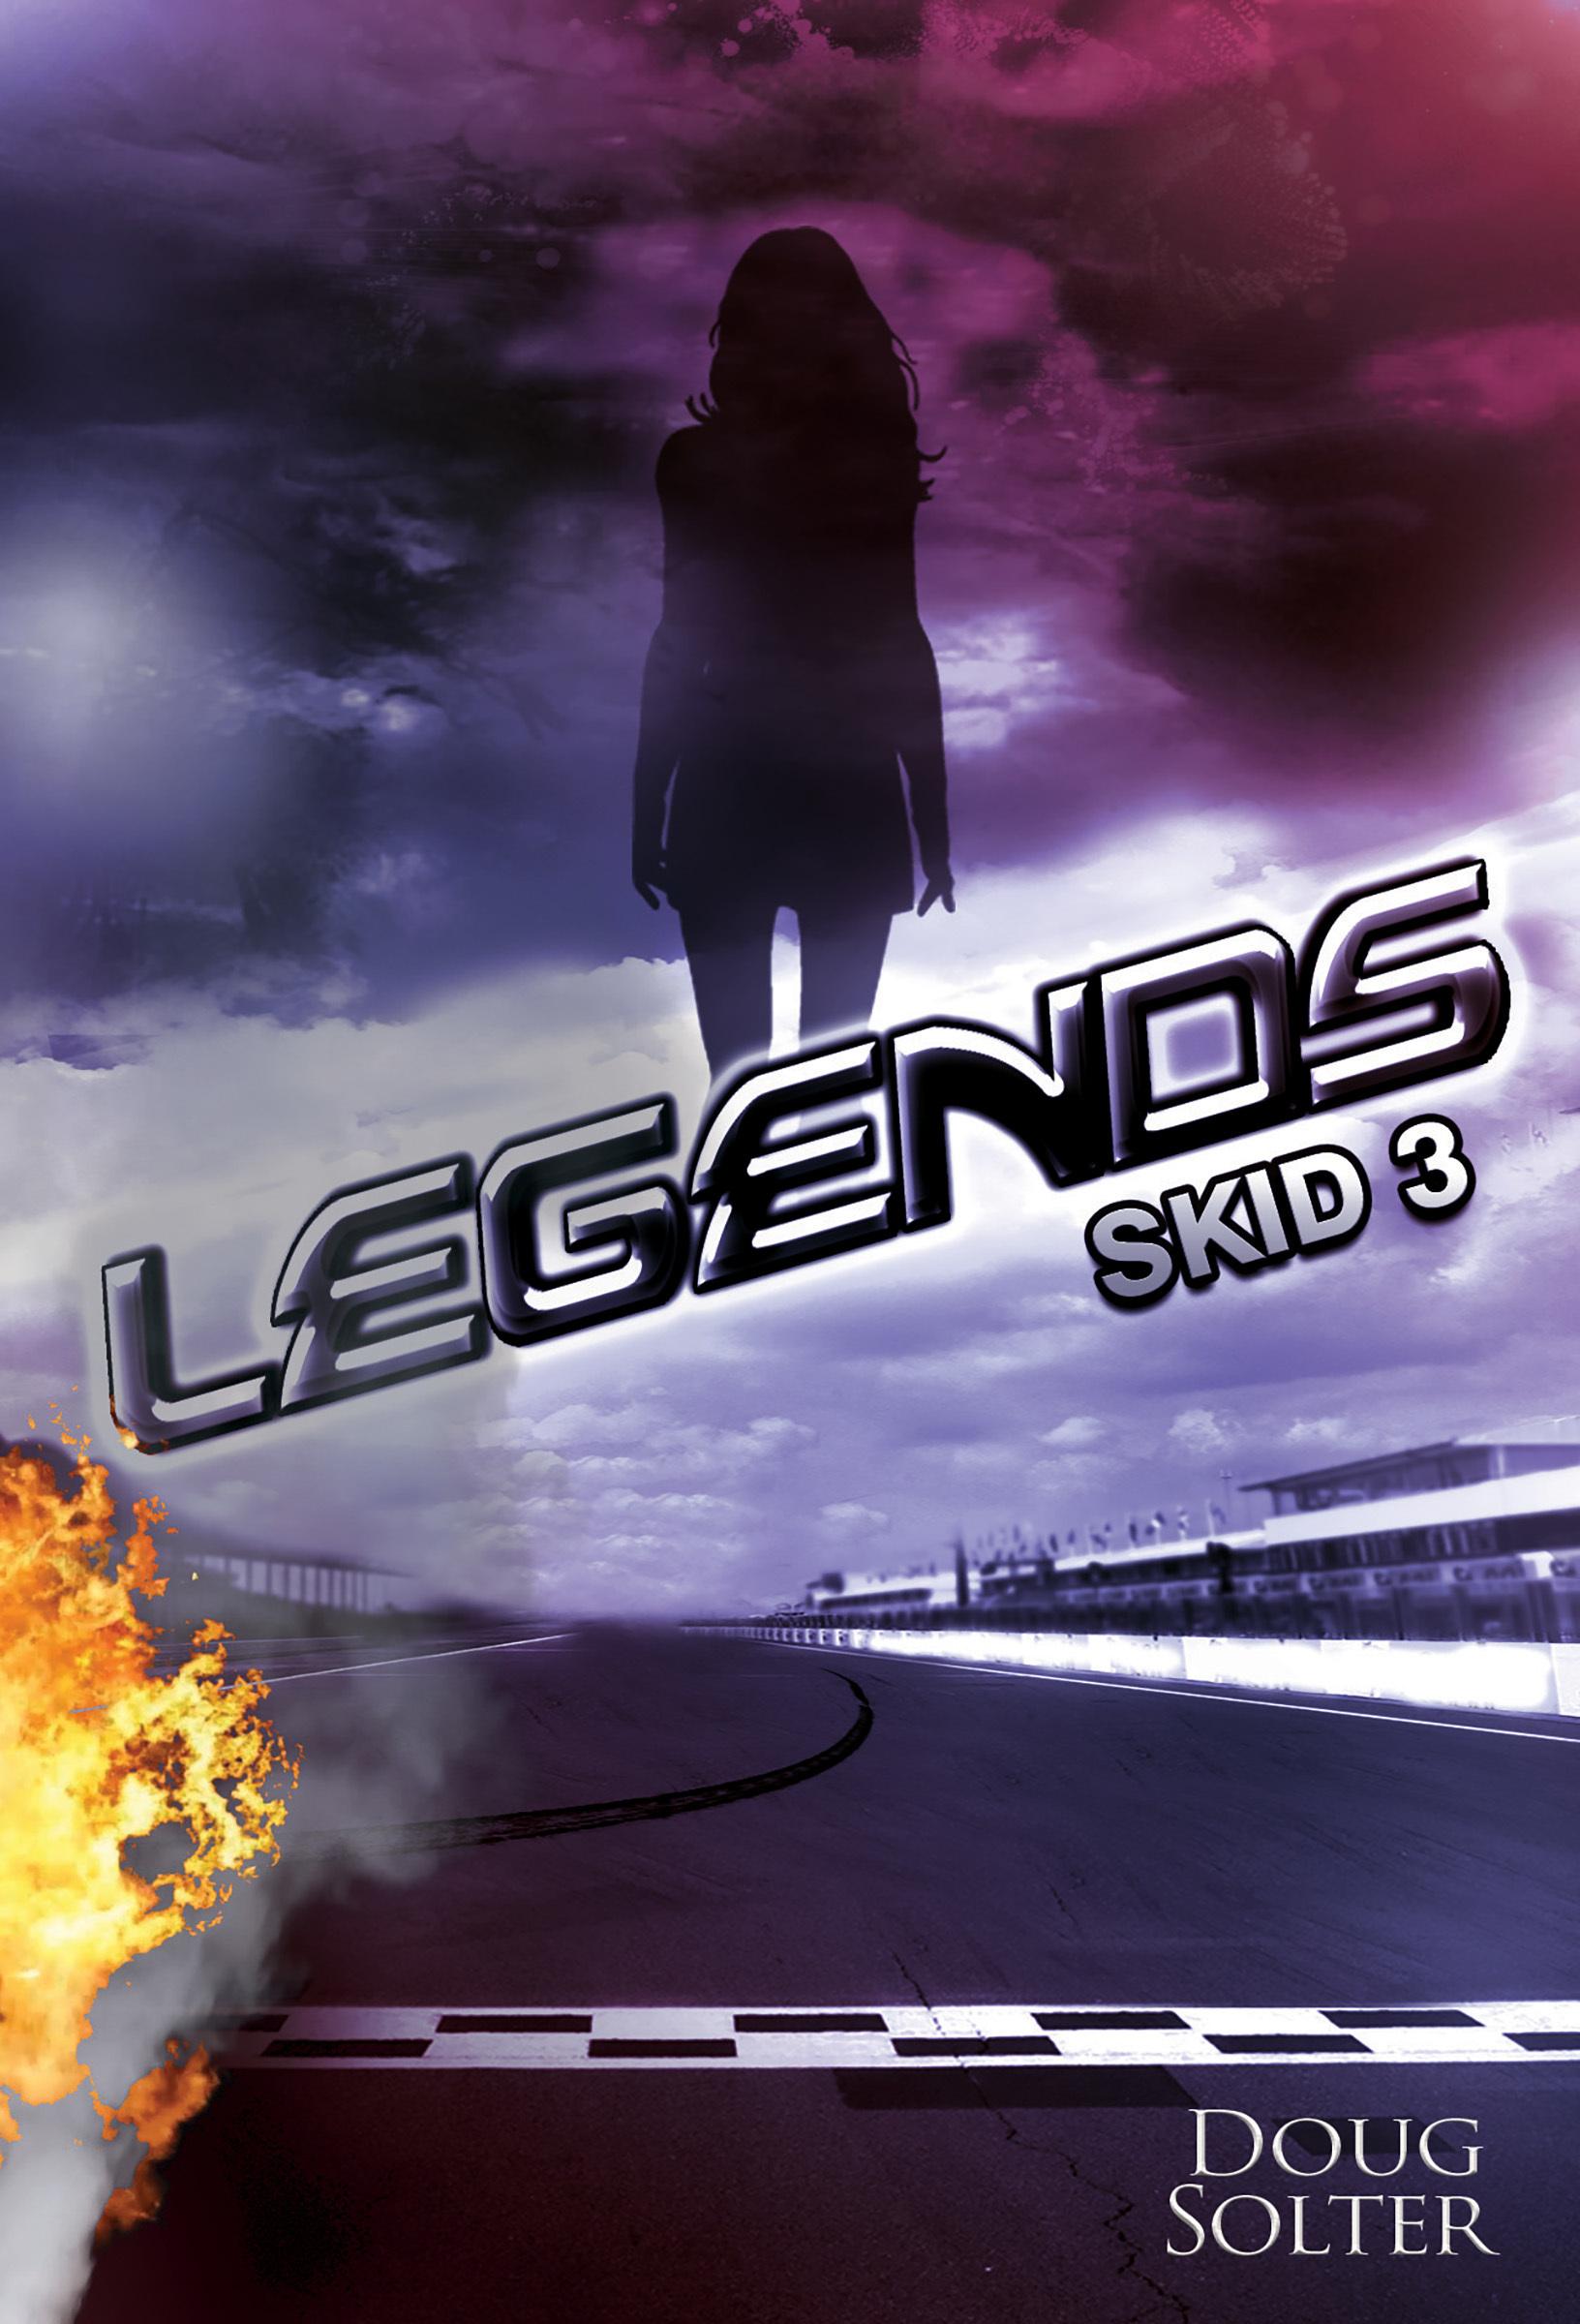 Legends (Skid, #3) Doug Solter